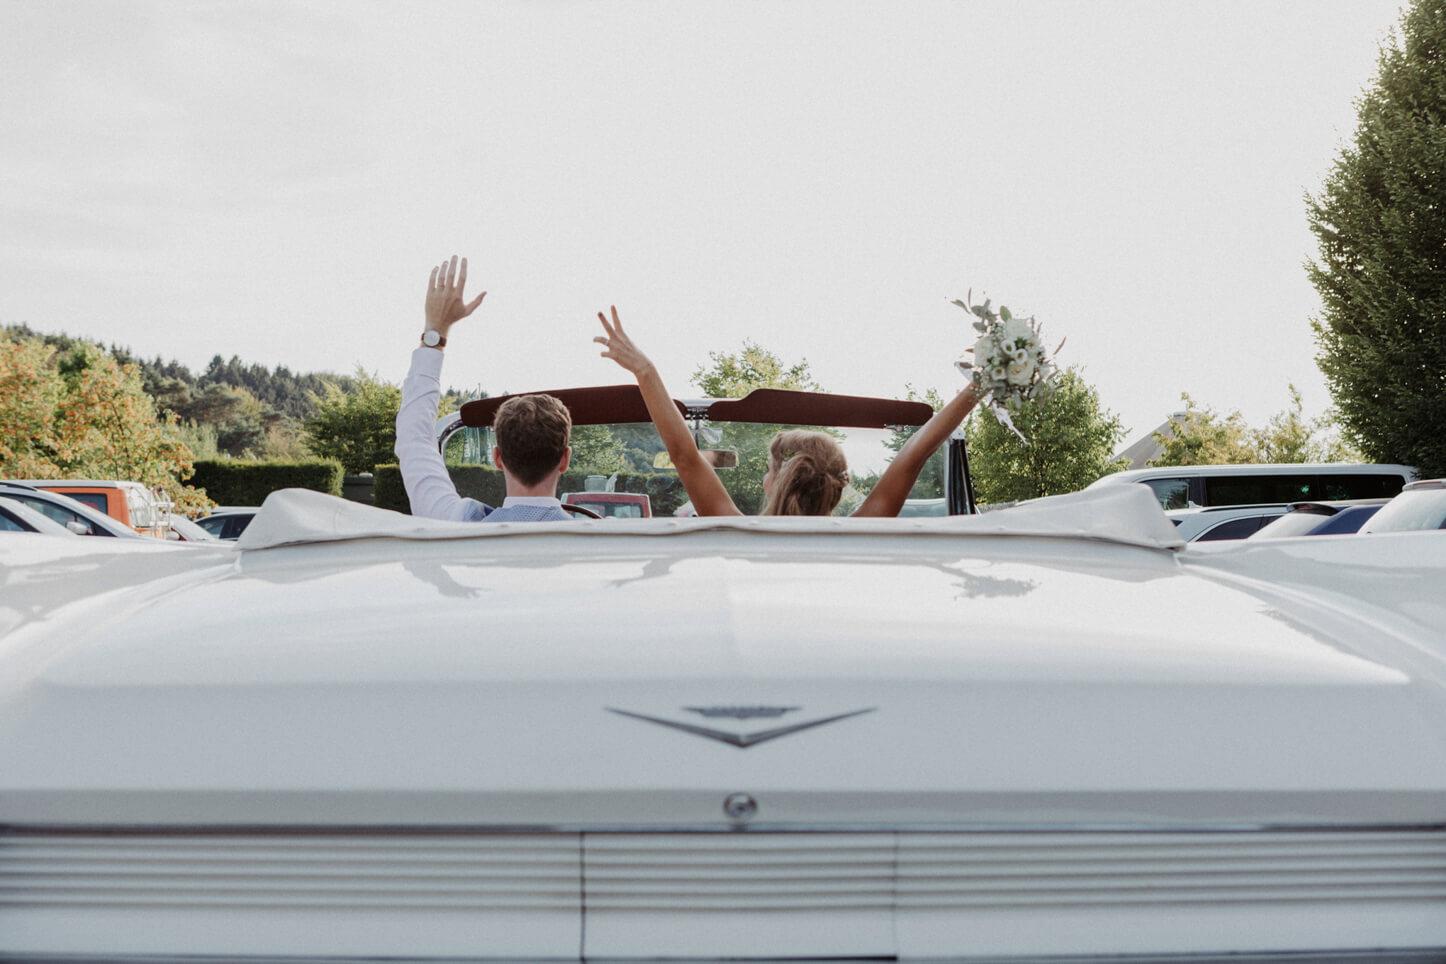 Brautpaar im Cadillac